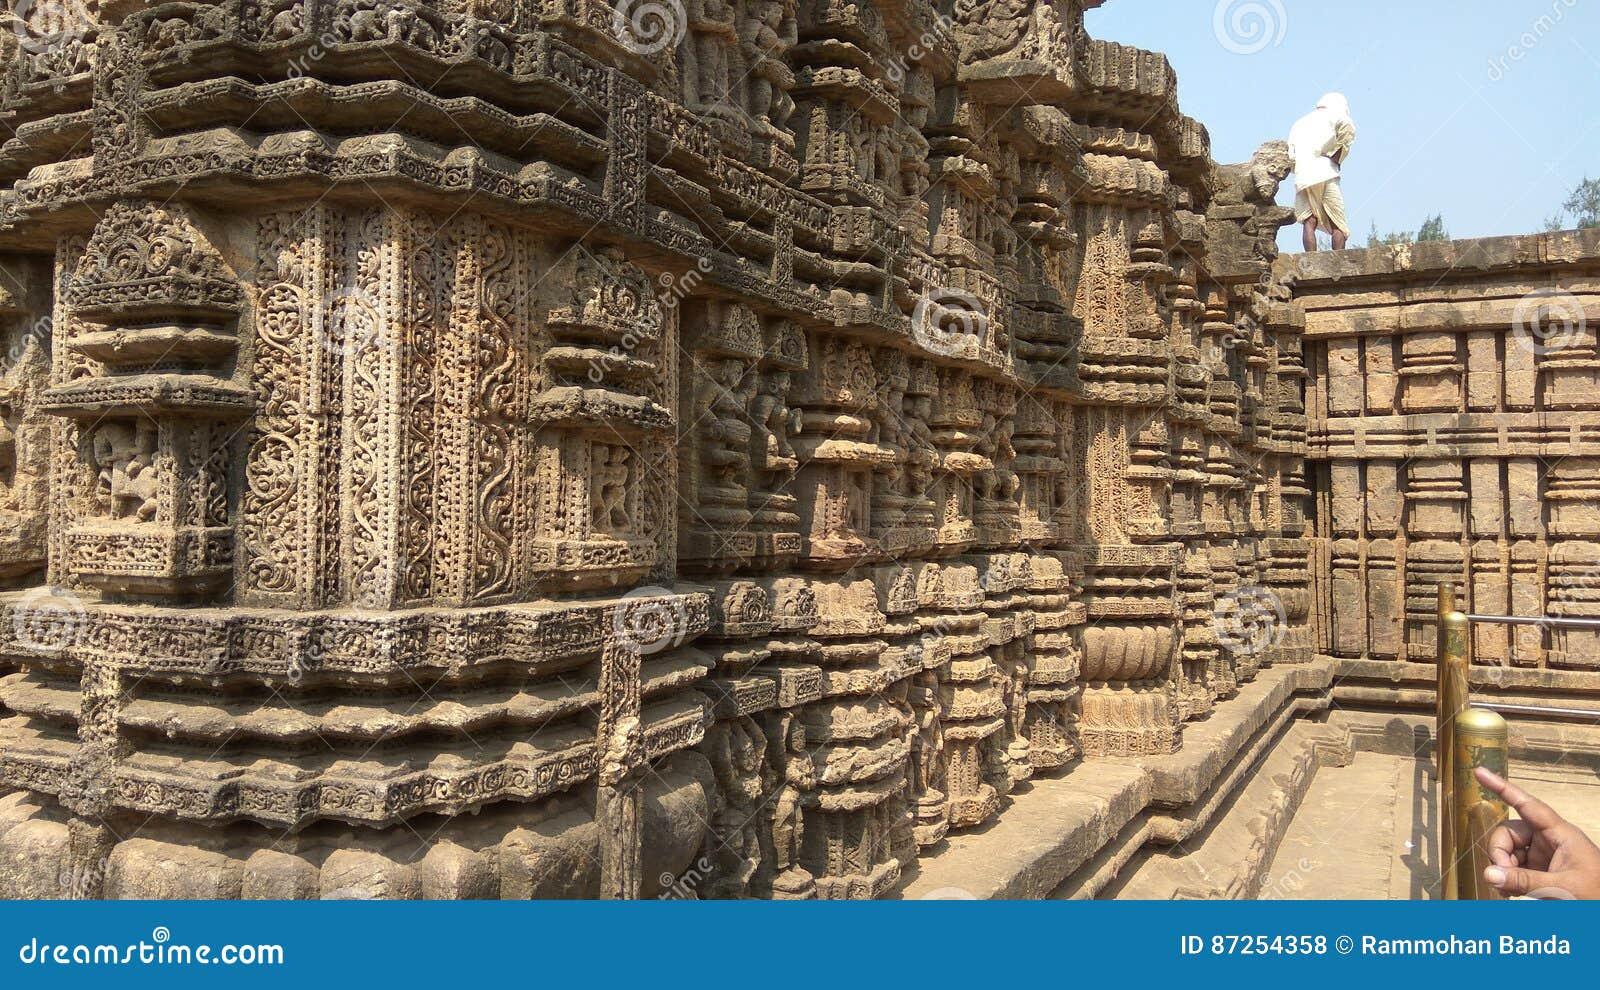 Konark Sun Temple - Architectural Beauty of India